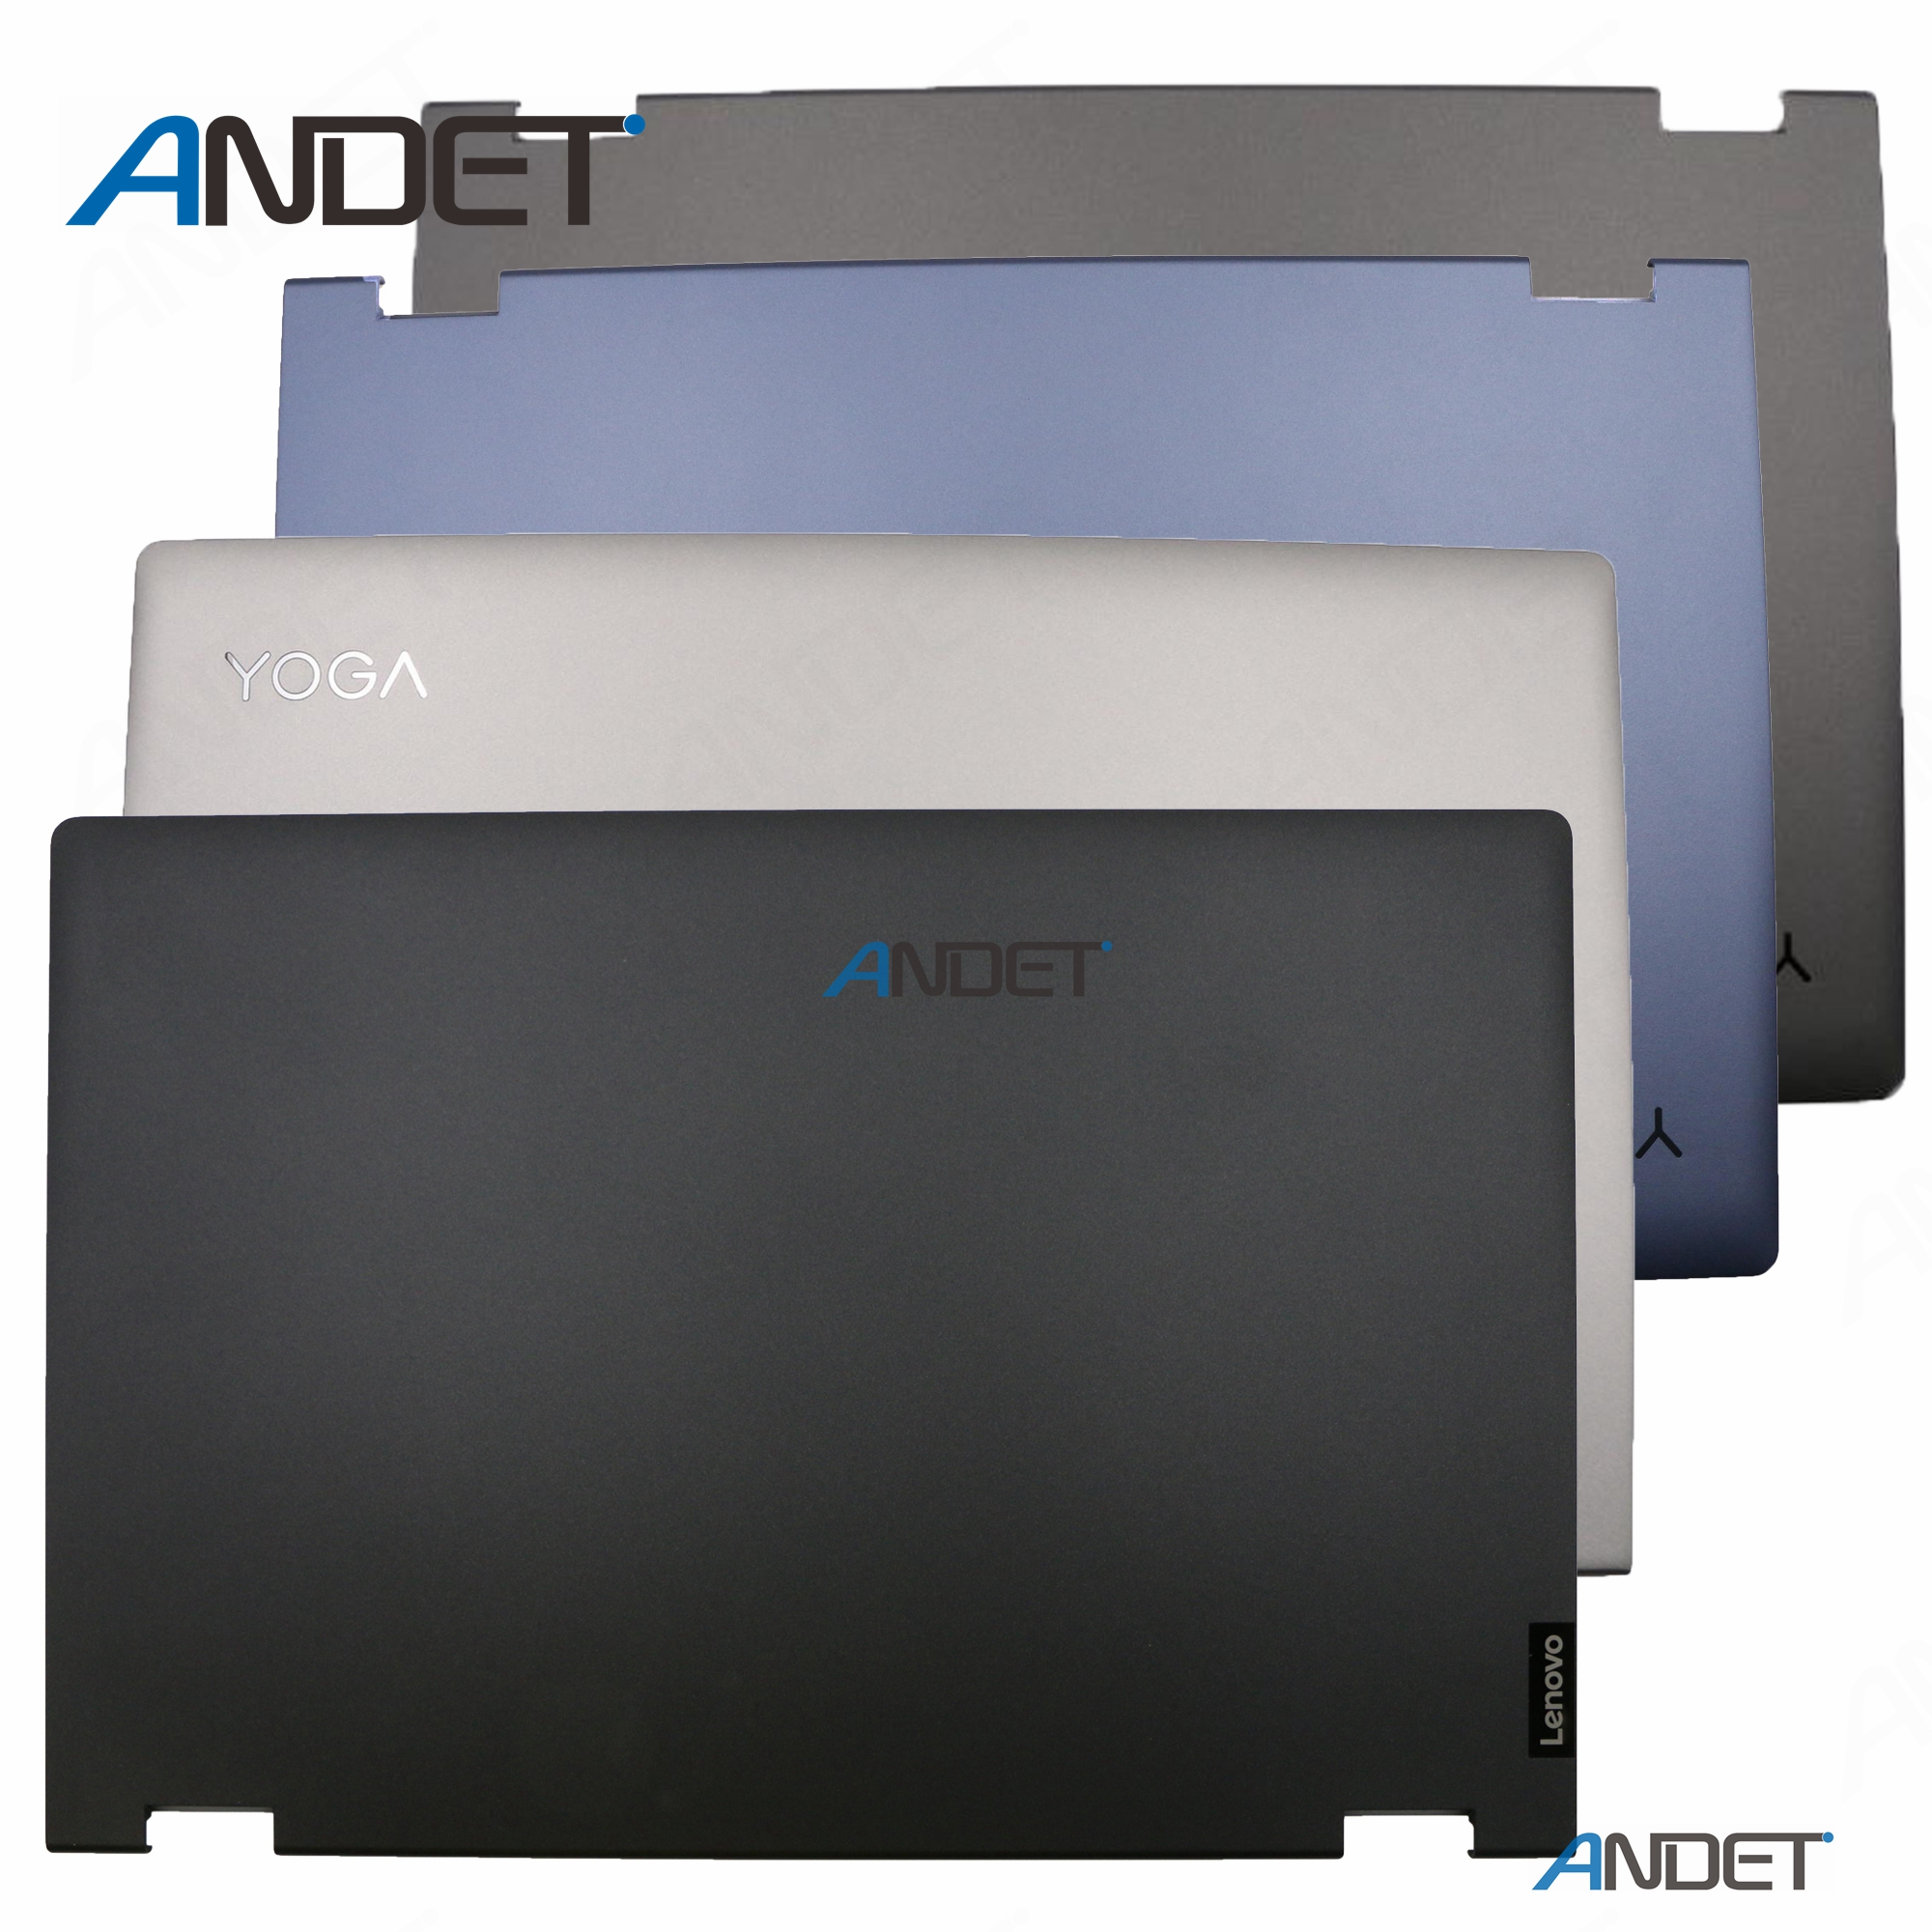 New Original For Lenovo YOGA 530 14 530-14 FLEX 6-14 LCD Back Cover Rear Lid Top Case Black Blue Silver AP173000100 AP173000110